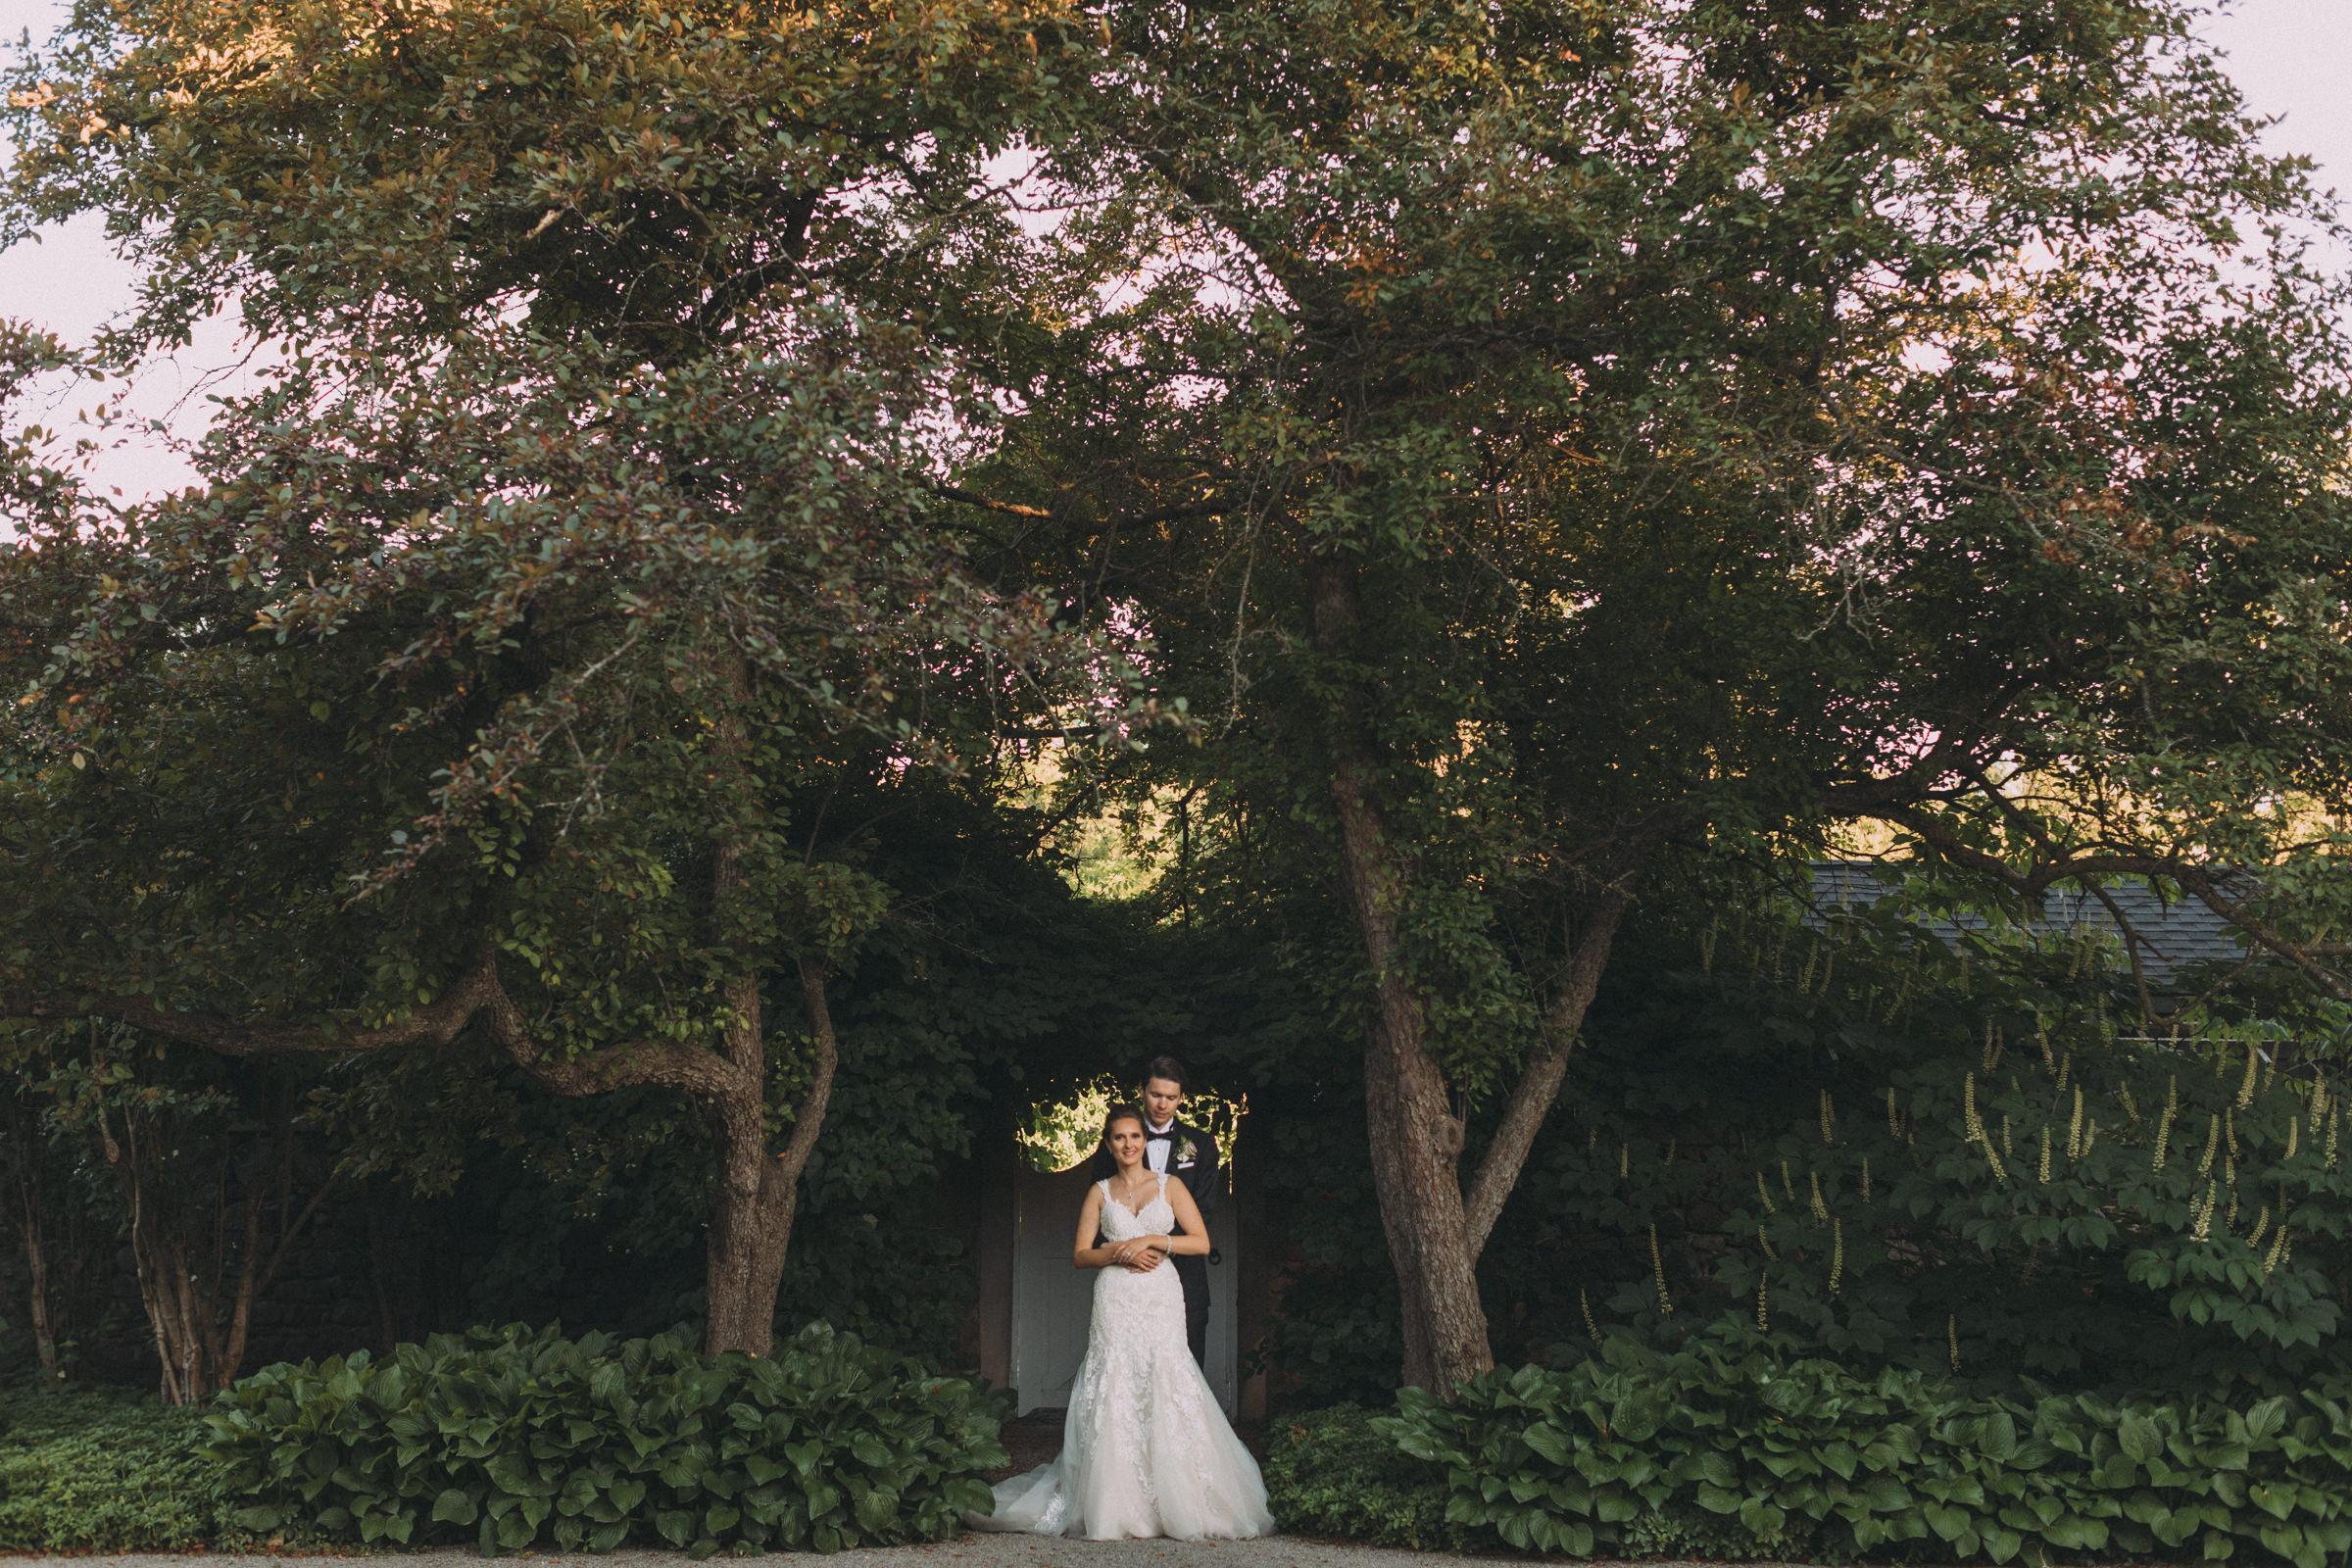 Langdon-Hall-wedding-photography-Cambridge-by-Sam-Wong-of-Visual-Cravings_Sarah-Ryan_43.jpg